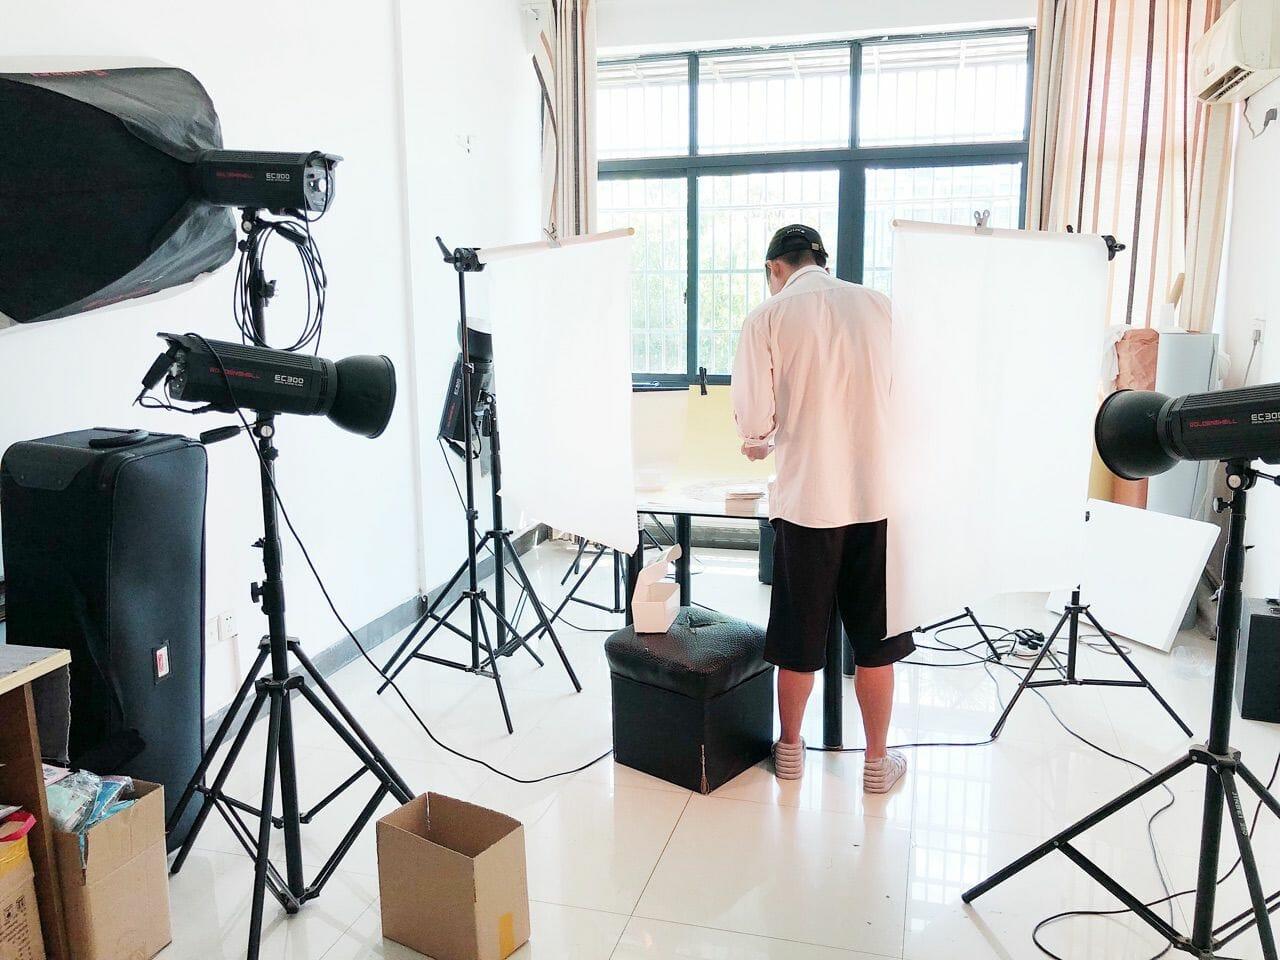 Product Photography – Fulfillman